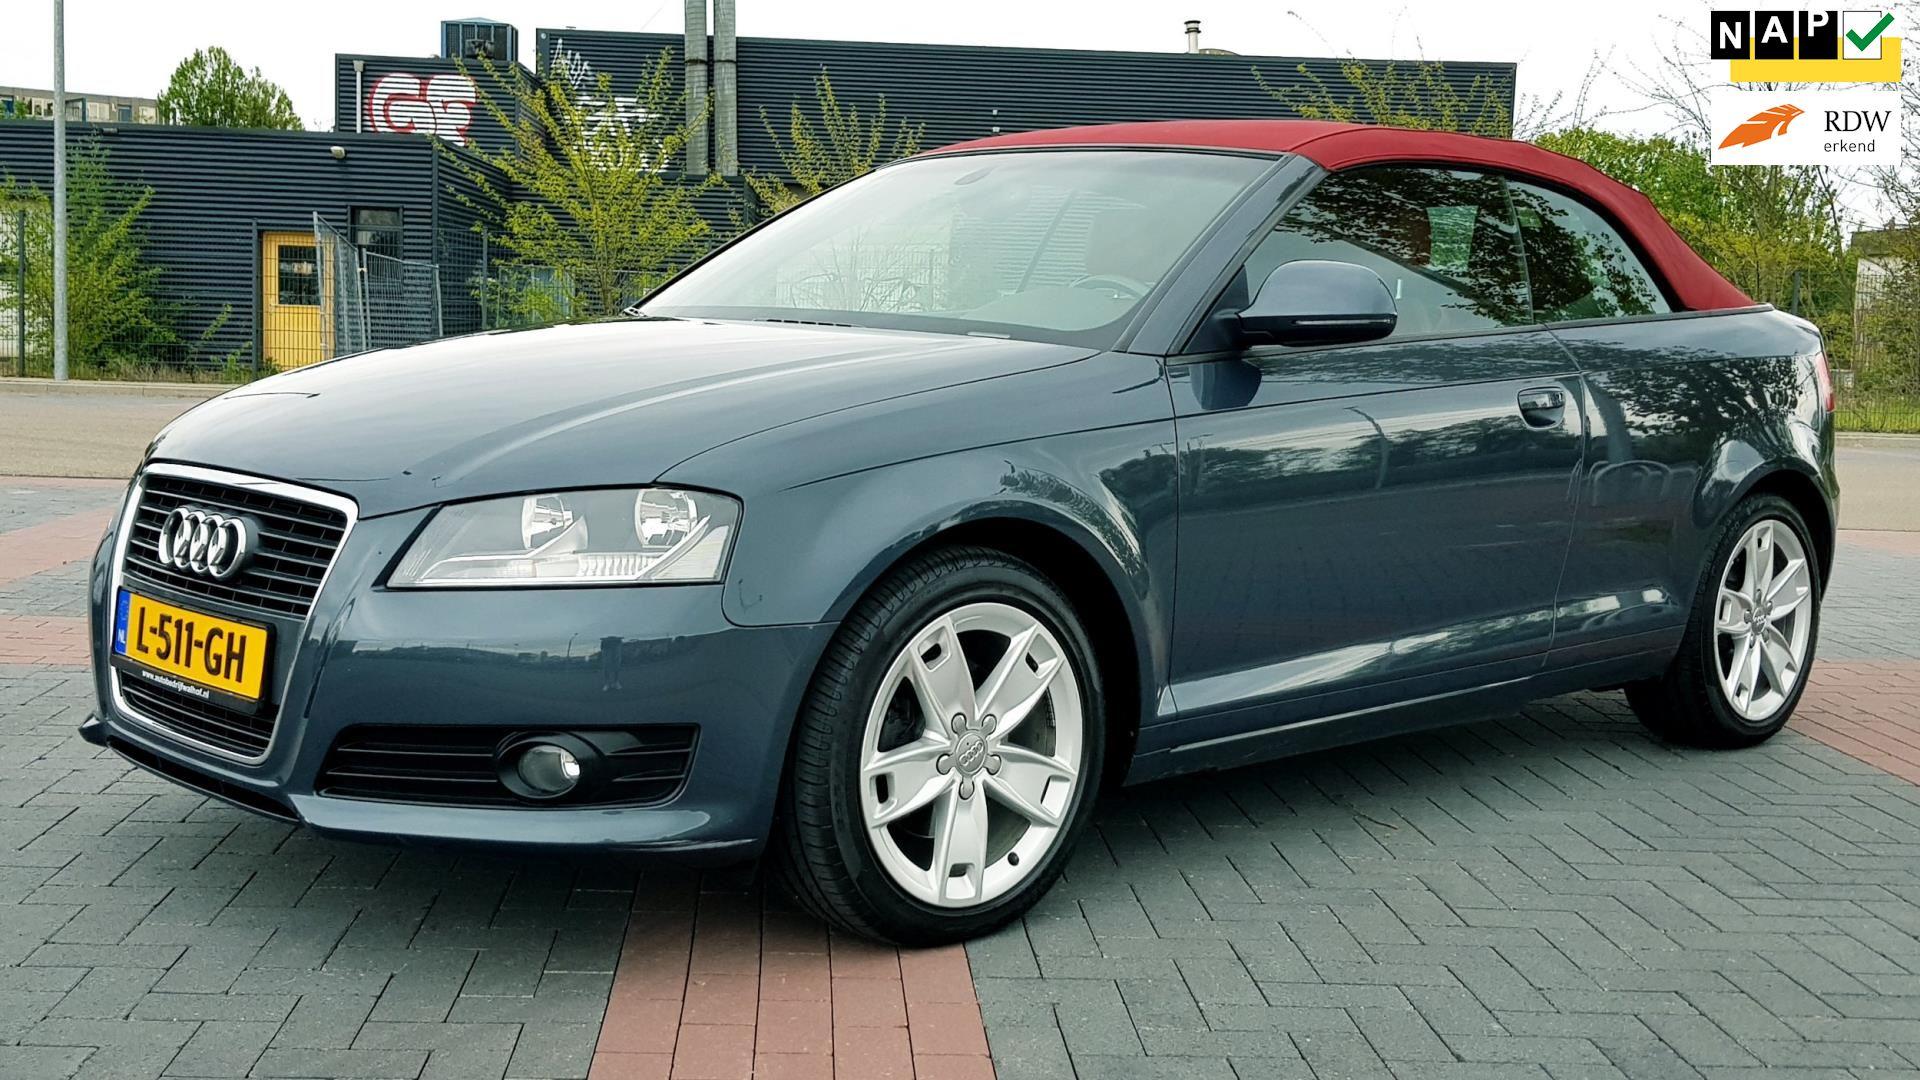 Audi A3 Cabriolet occasion - Autobedrijf R. Walhof